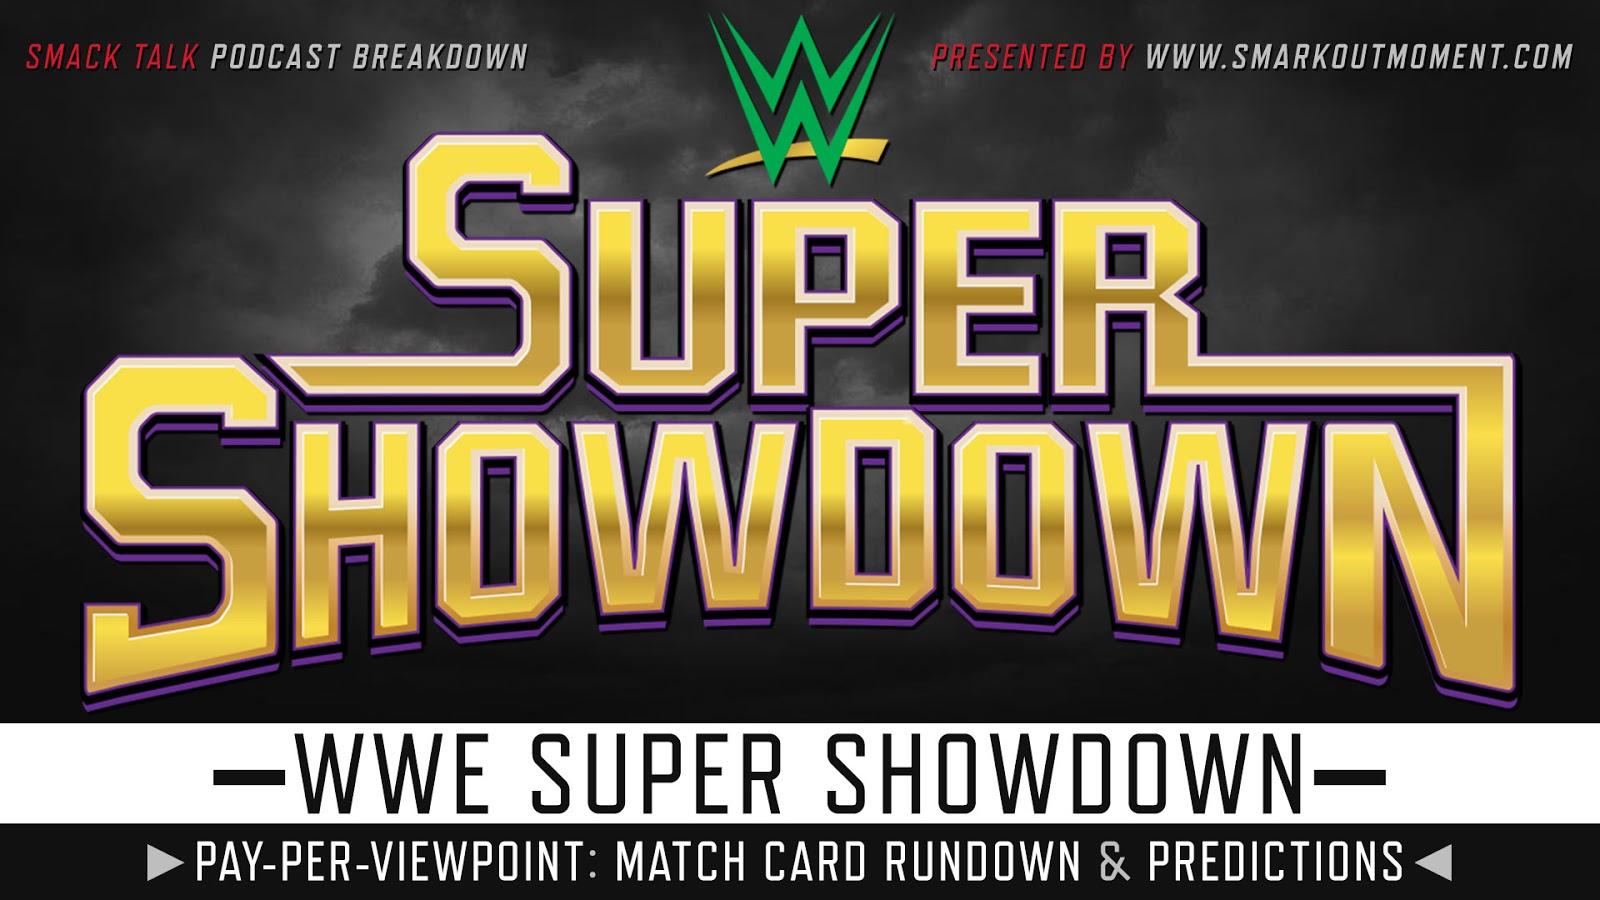 WWE Super ShowDown 2019 spoilers podcast